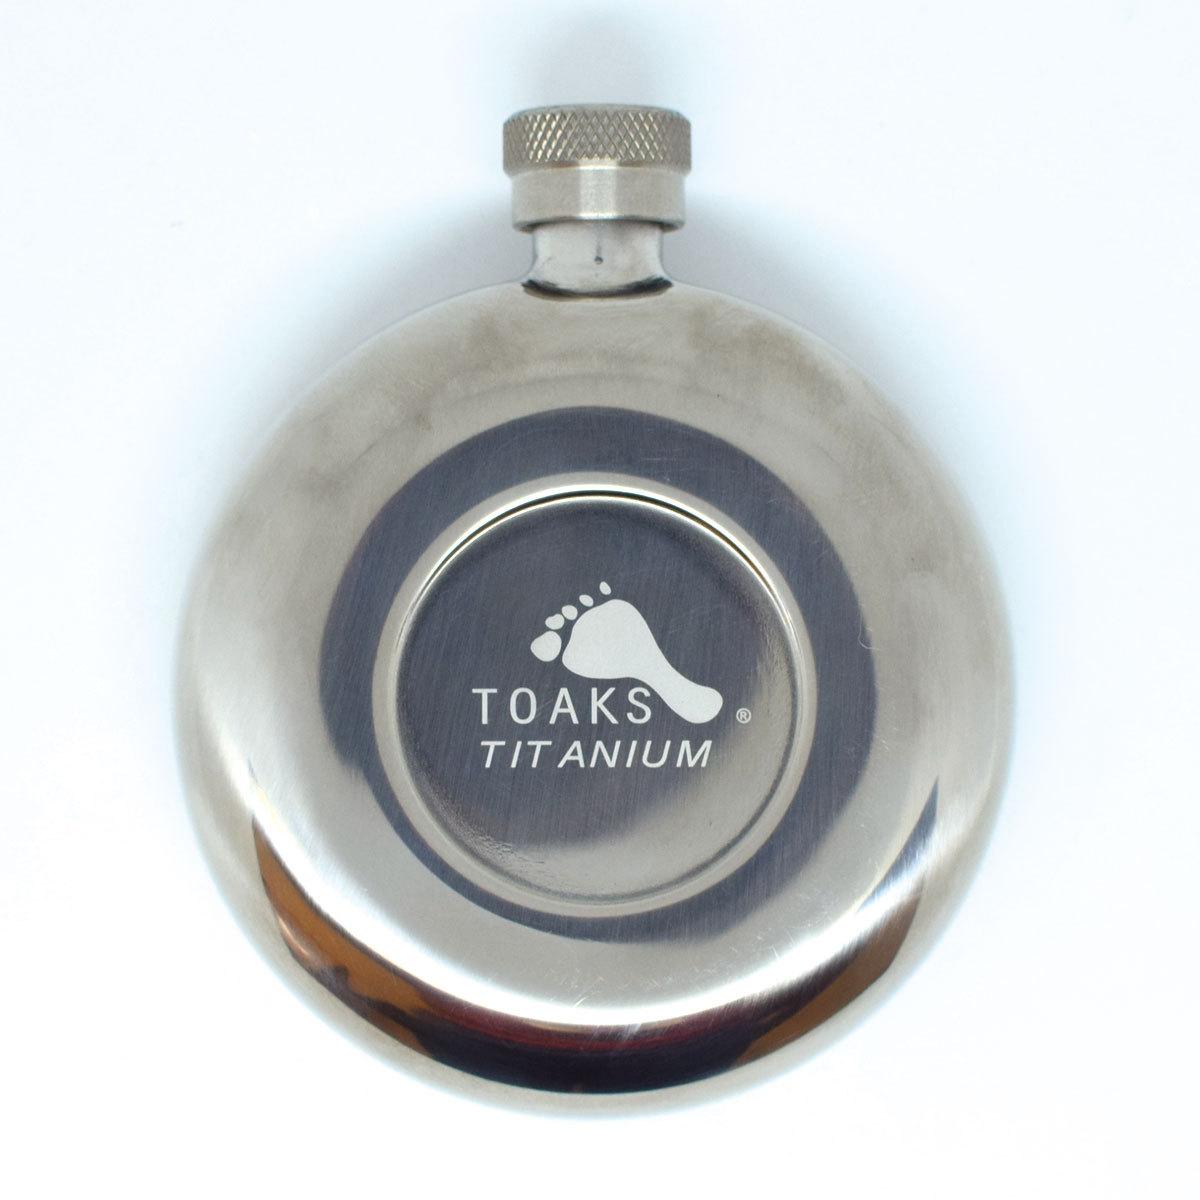 TOAKS(トークス)TITANIUM FLASK 150